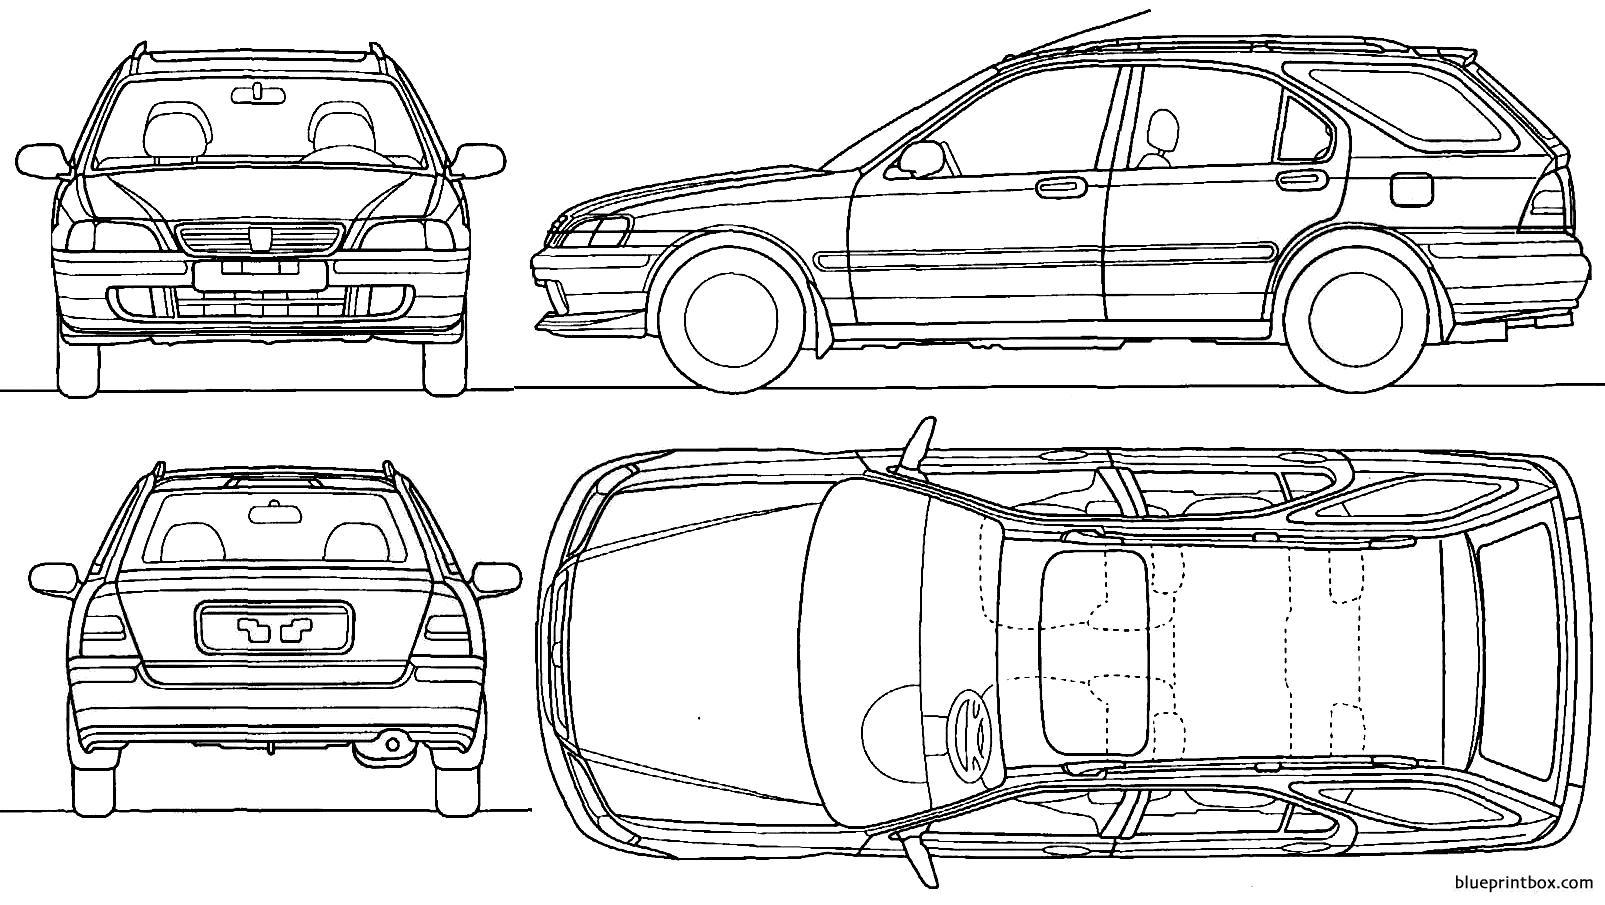 Honda Civic Aerodeck 1998 - Blueprintbox Com